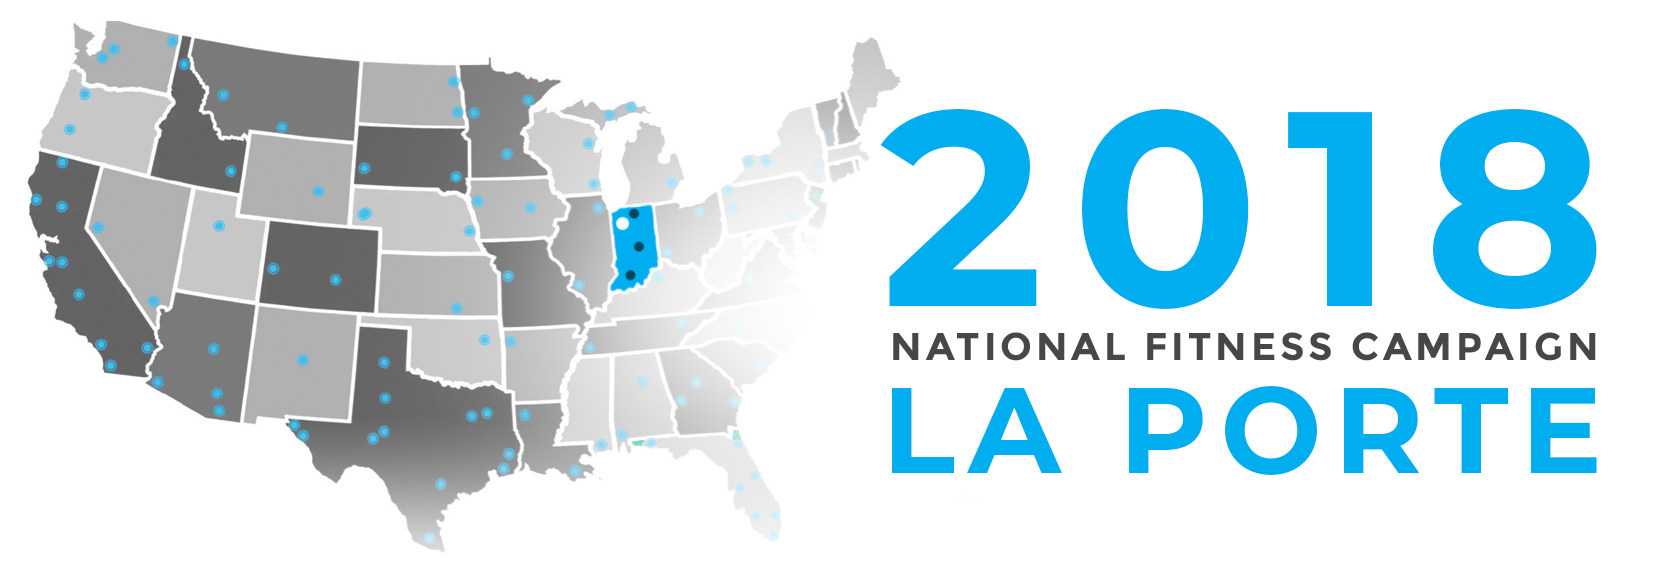 2018 Campaign Logo La Porte.png